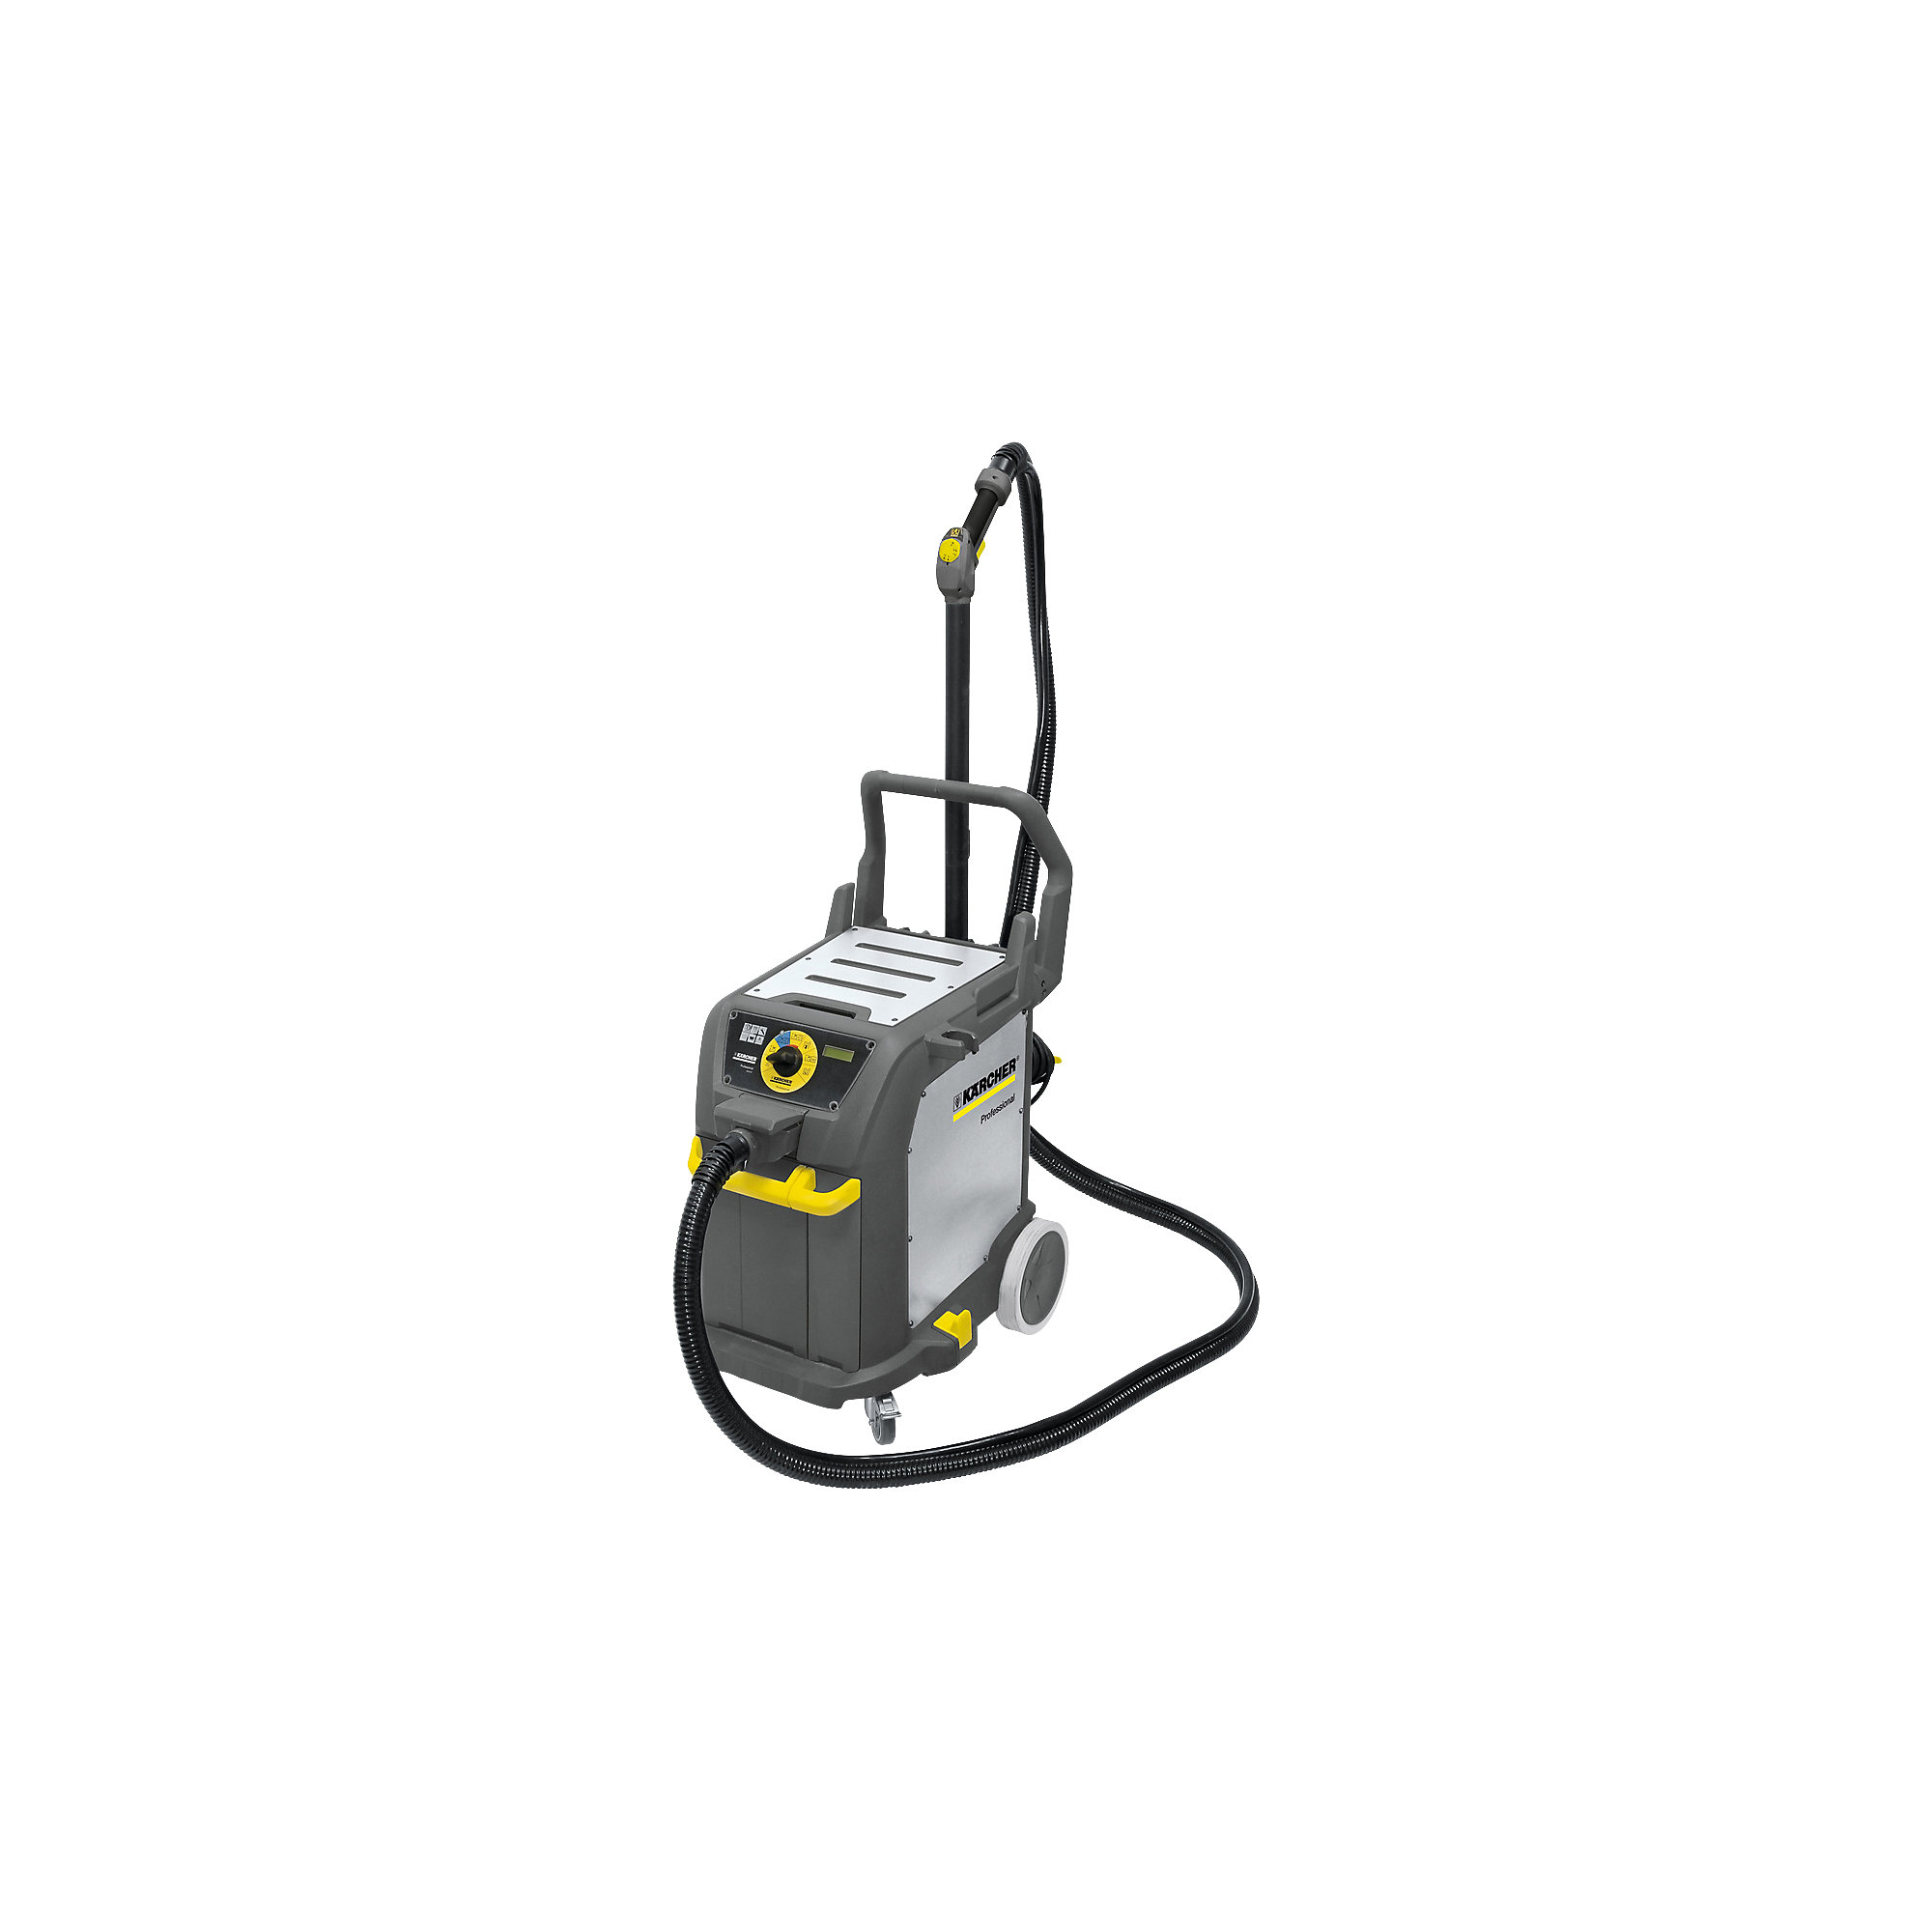 Karcher SGV 8/5 GB Steam Vacuum Cleaner